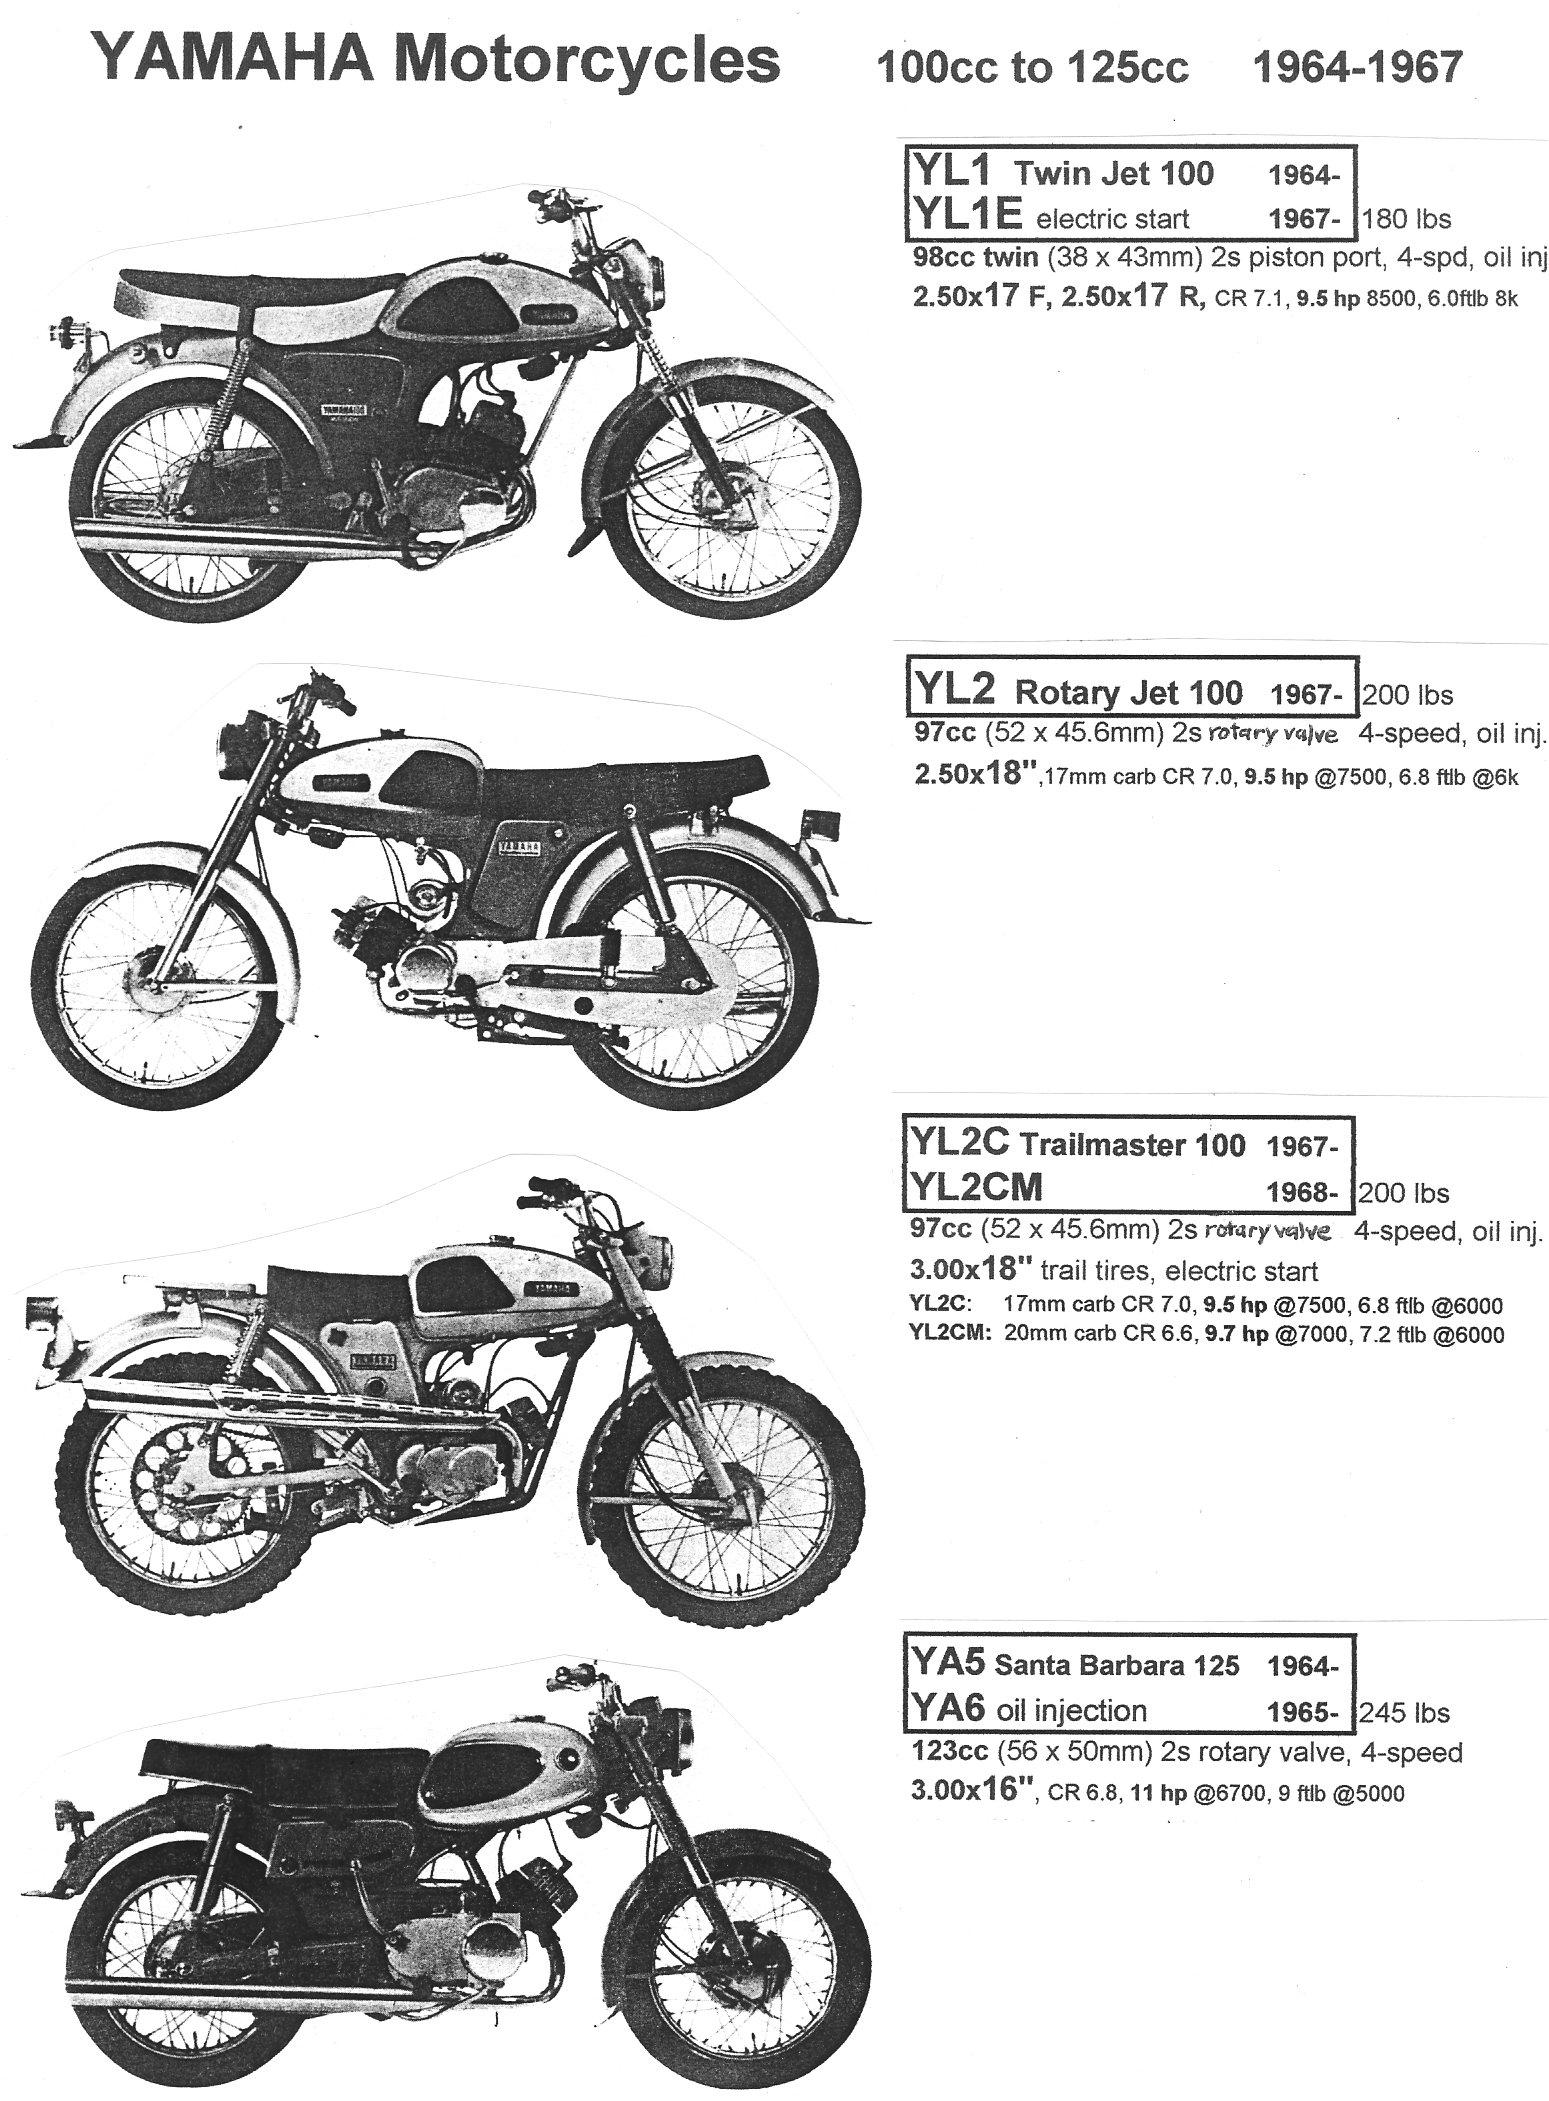 1978 Yamaha Dt 400 Wiring Diagram 1976 Yamaha DT 400